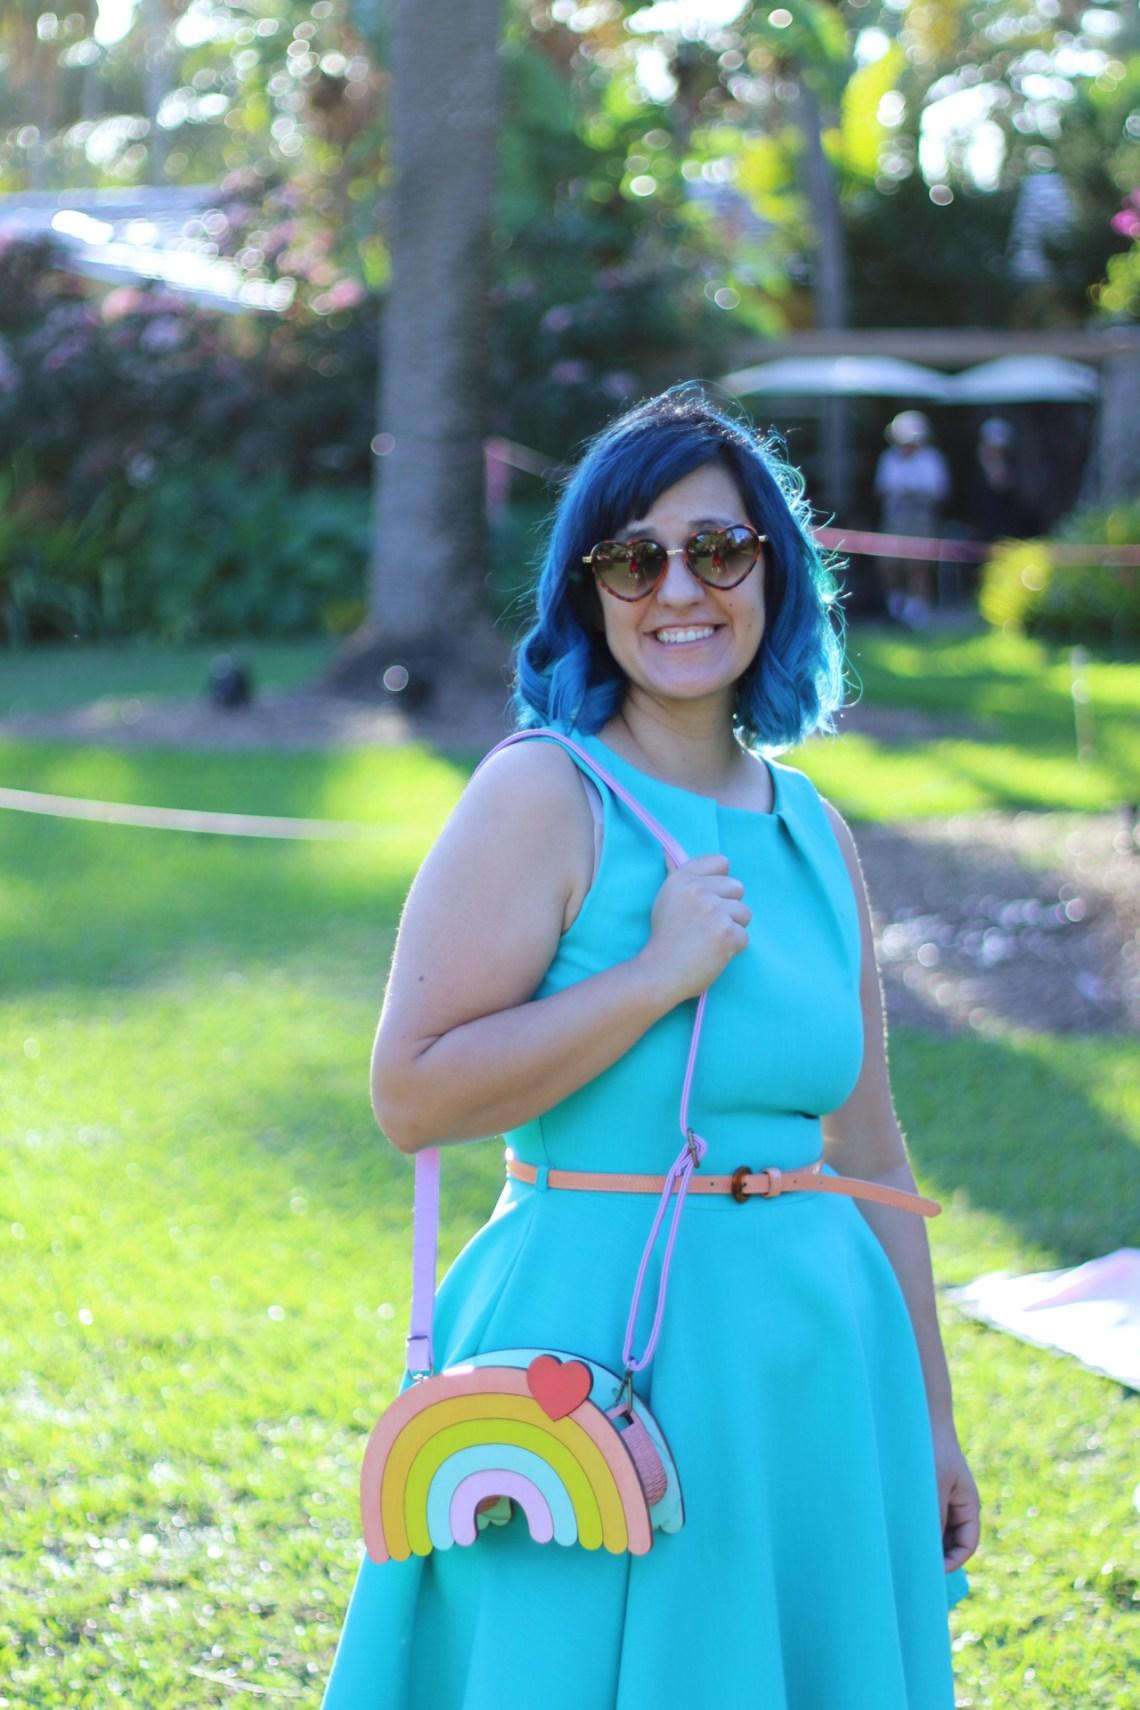 Cute rainbow bag made of wood and handpainted. Kawaii novelty purse.